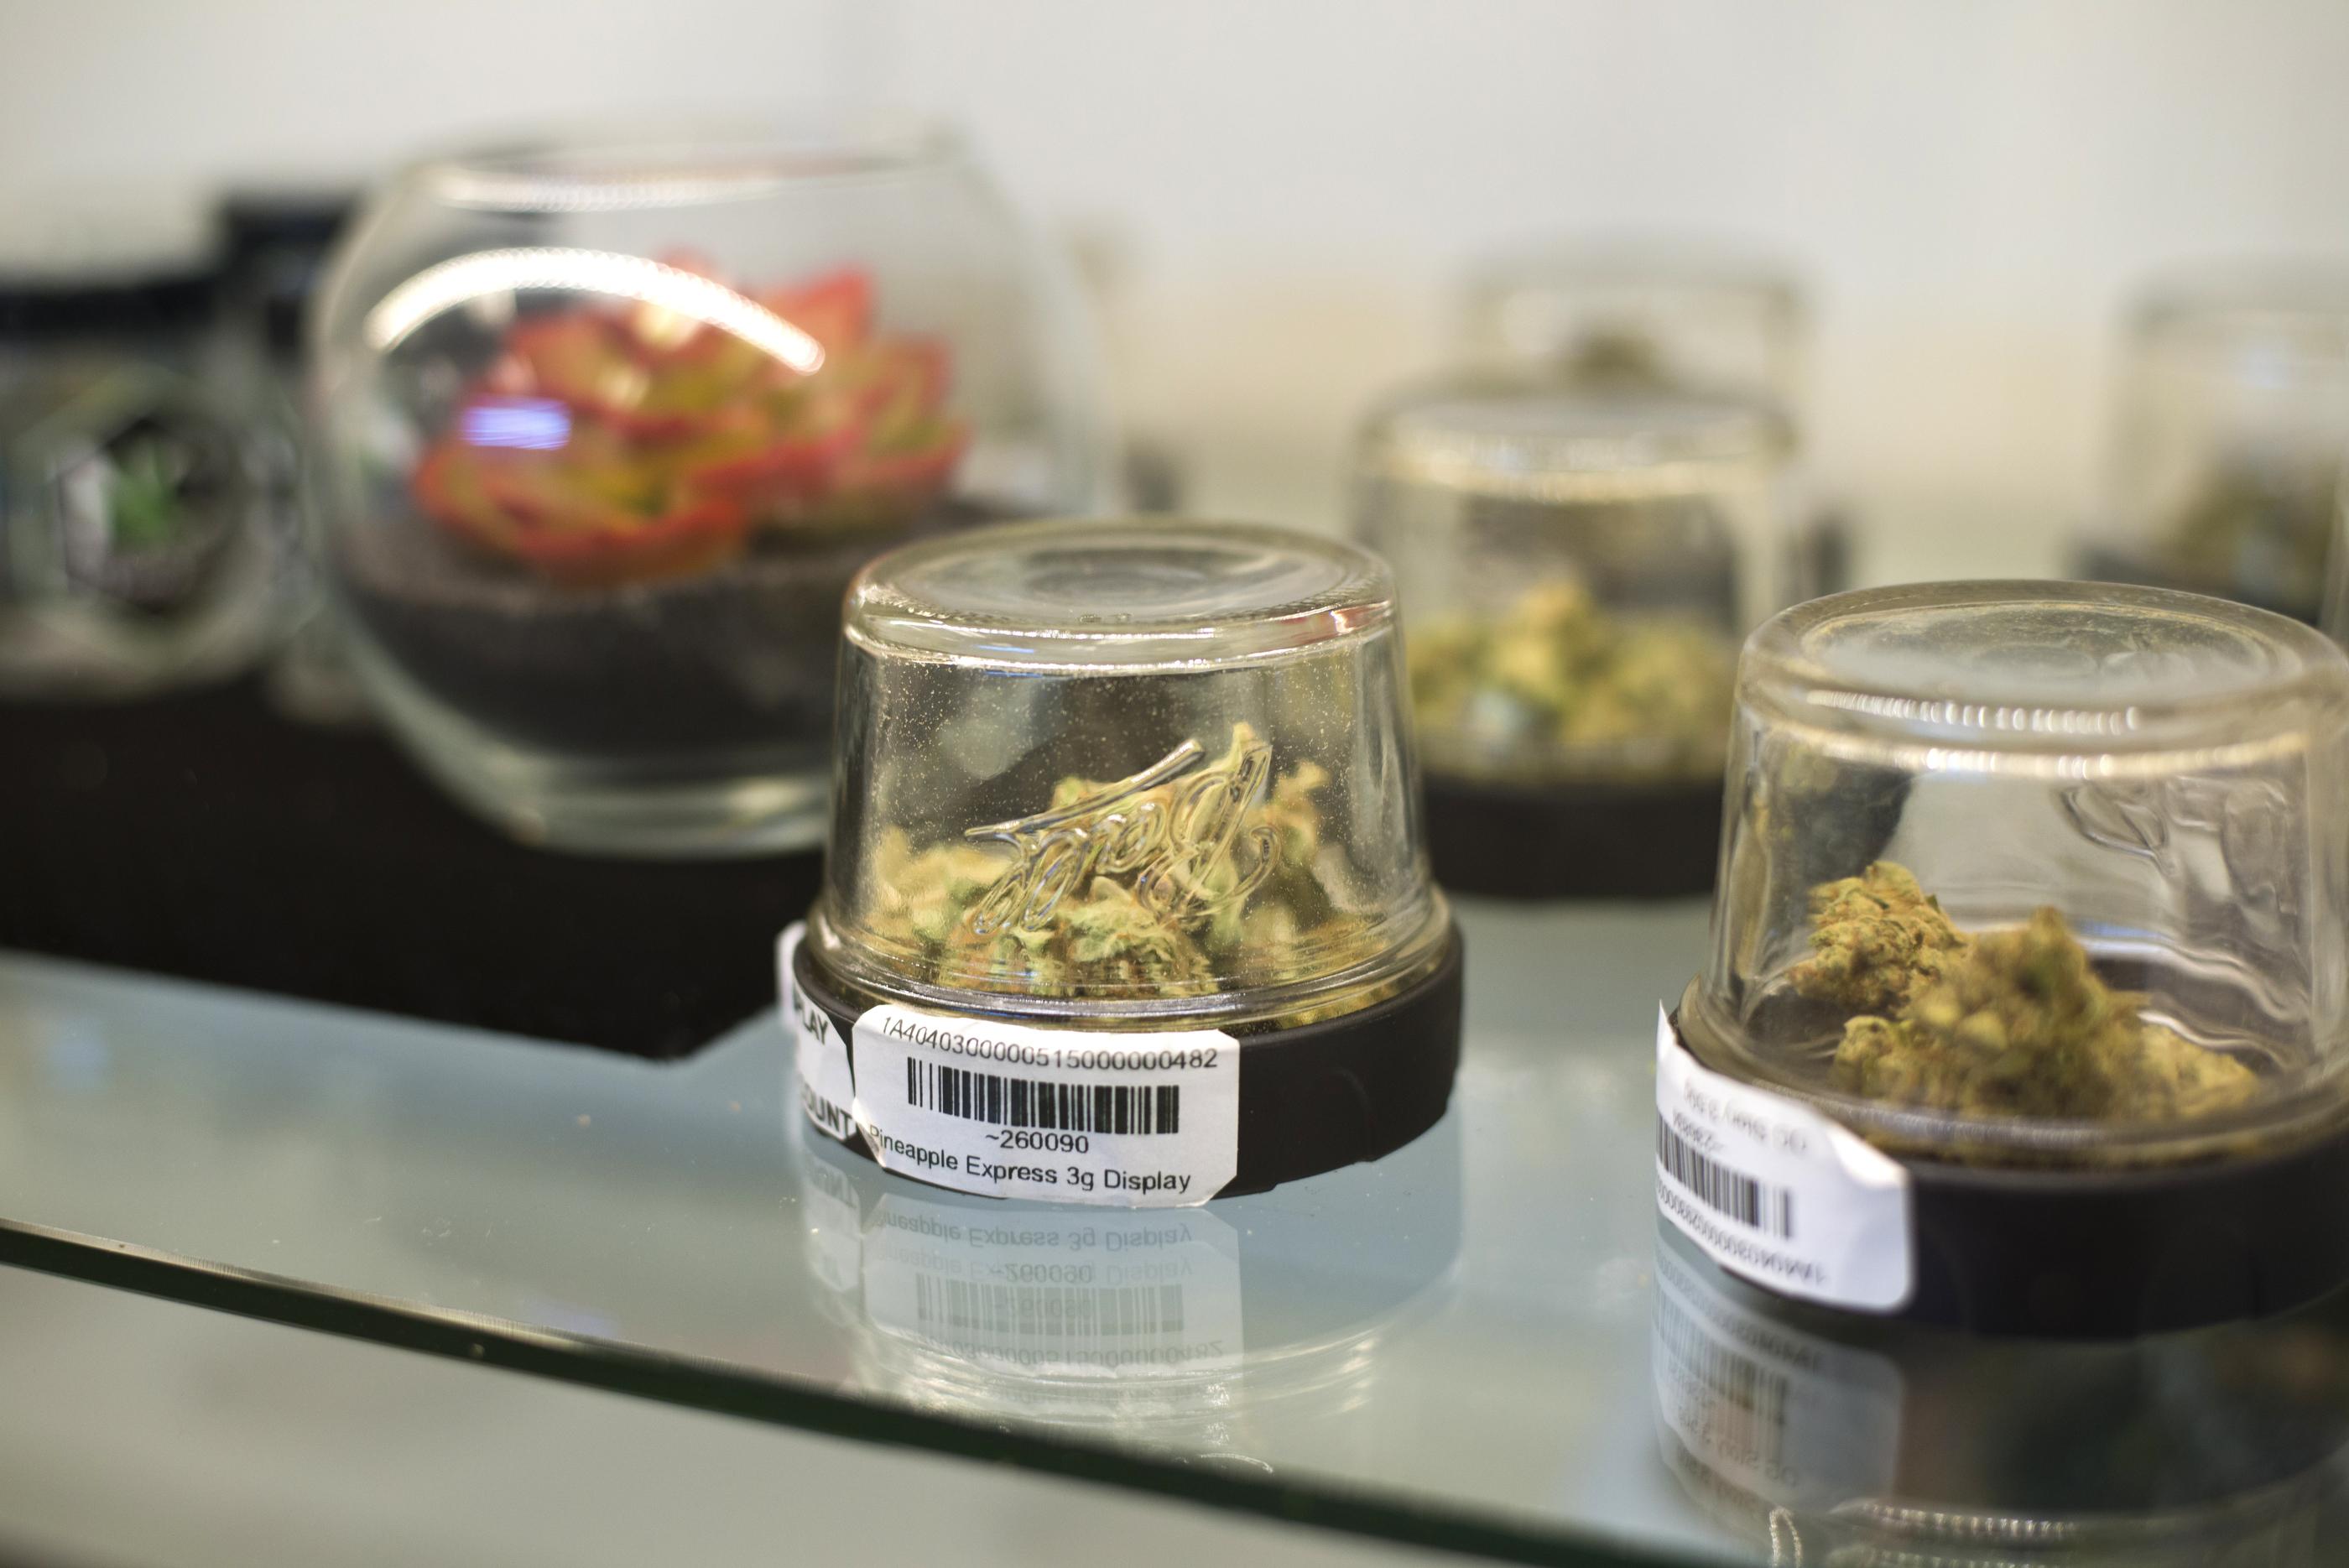 Marijuana displayed inside Inyo Fine Cannabis Dispensary